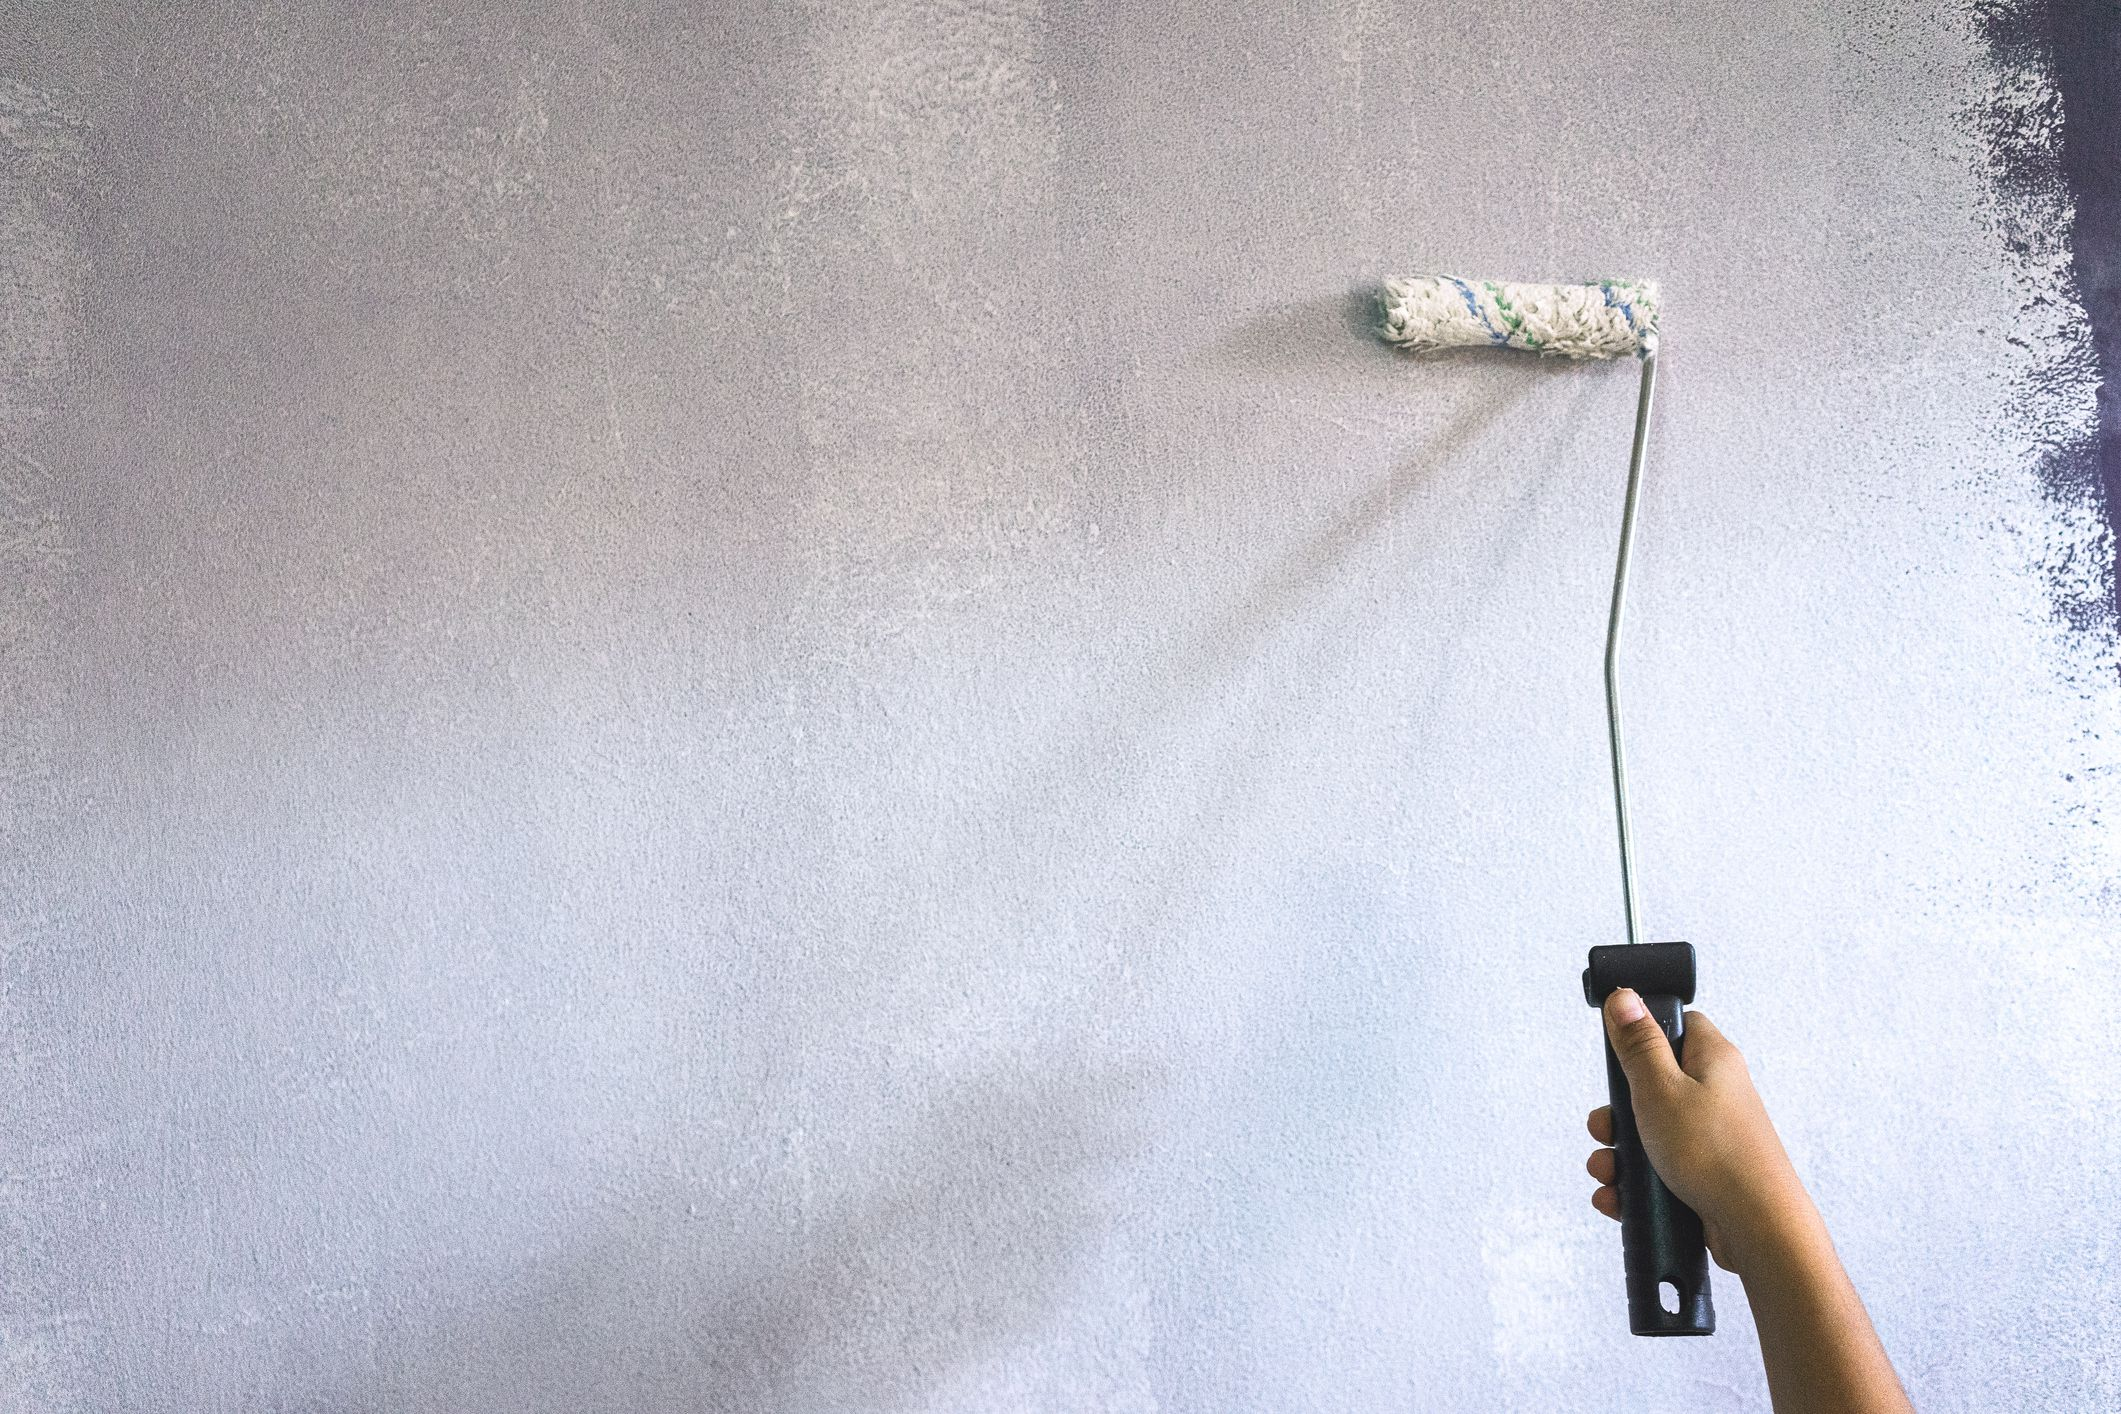 Lead paint primer sealer